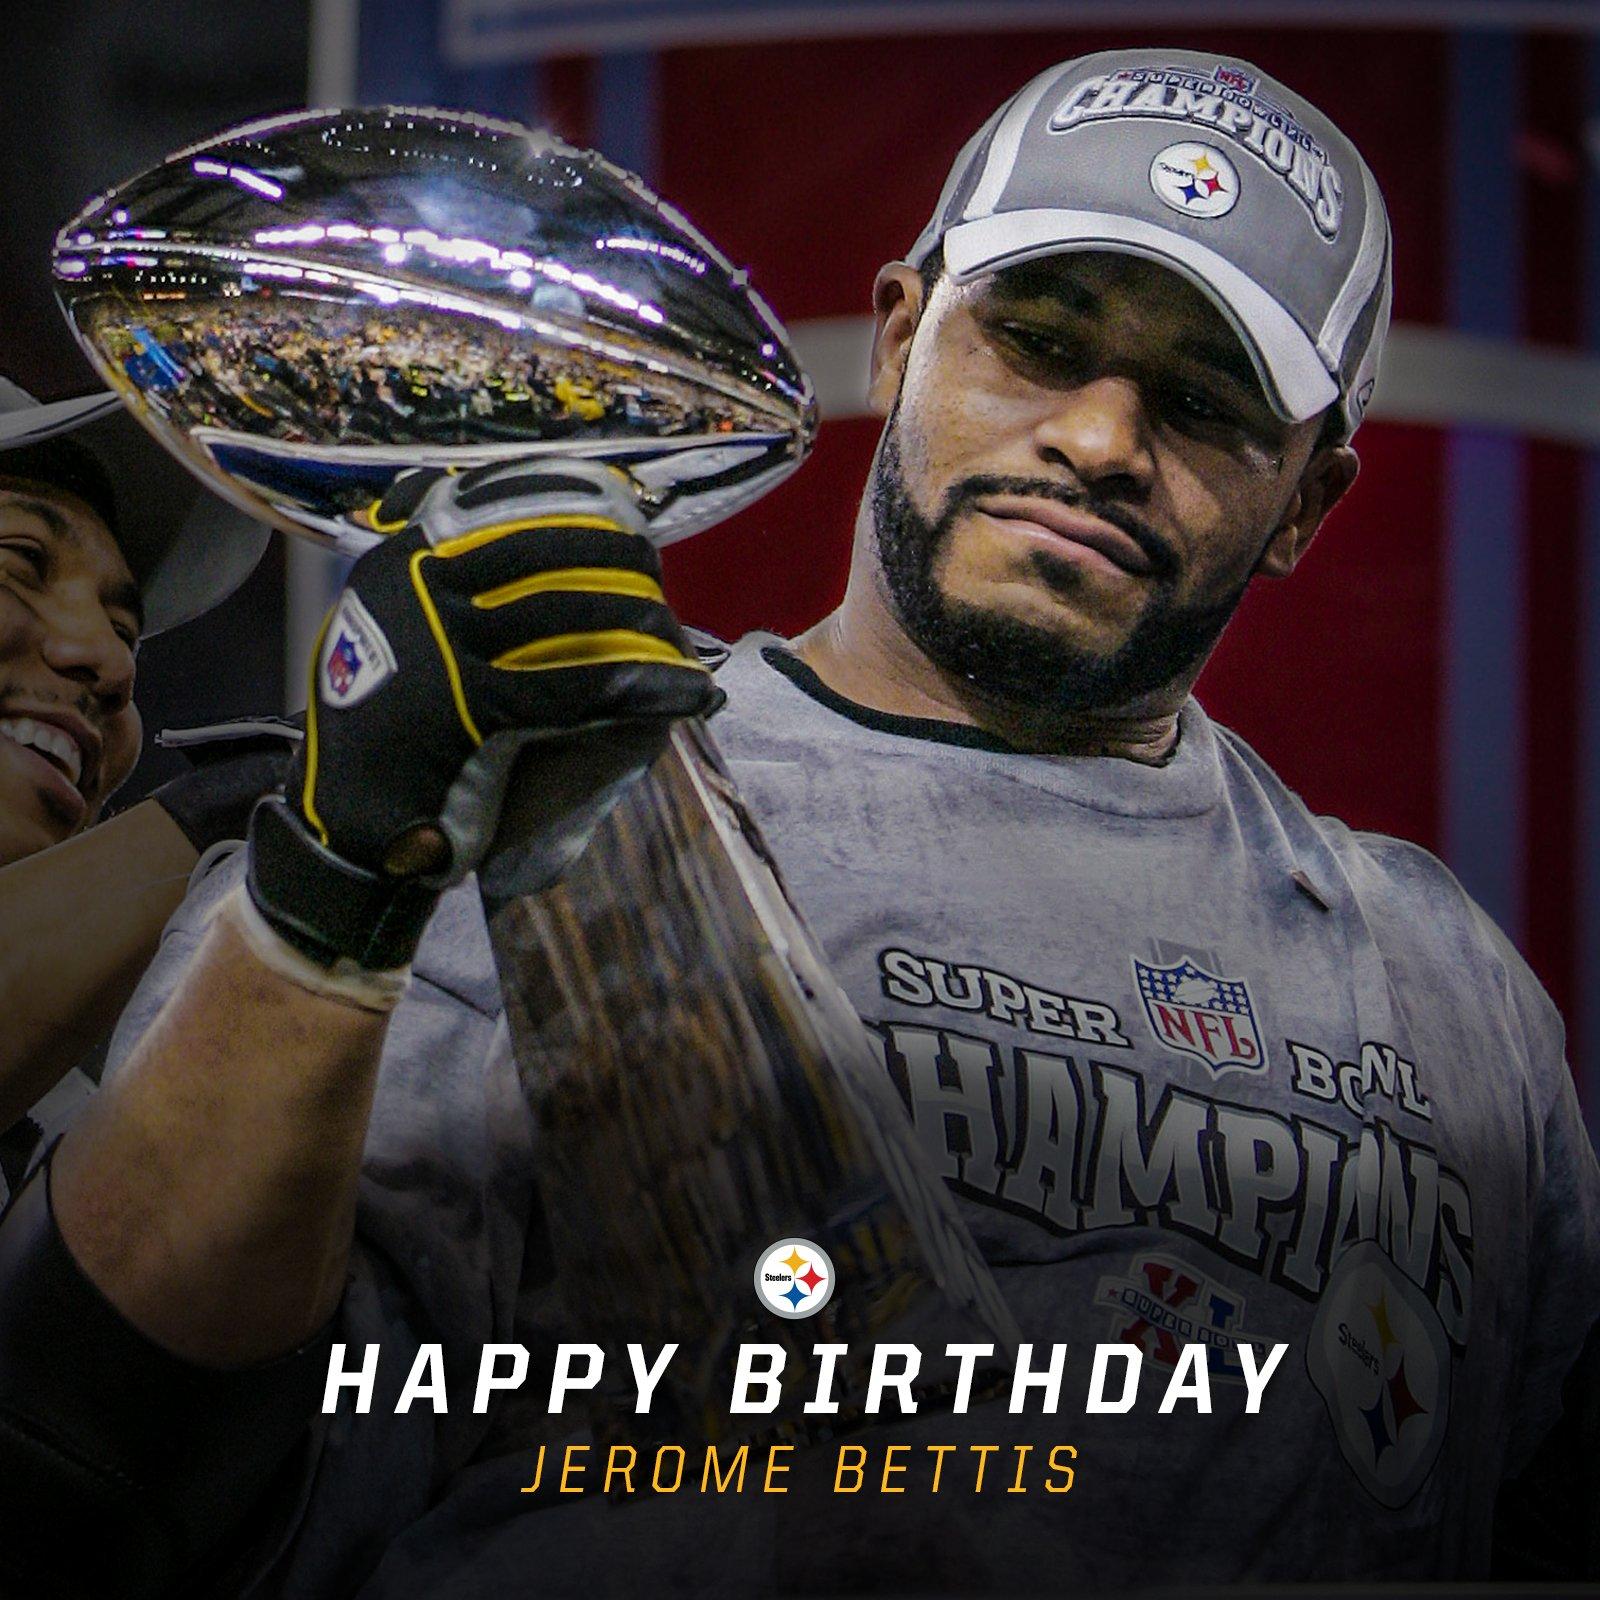 #HappyBusDay @JeromeBettis36‼️ https://t.co/Y6jUA7cSQD